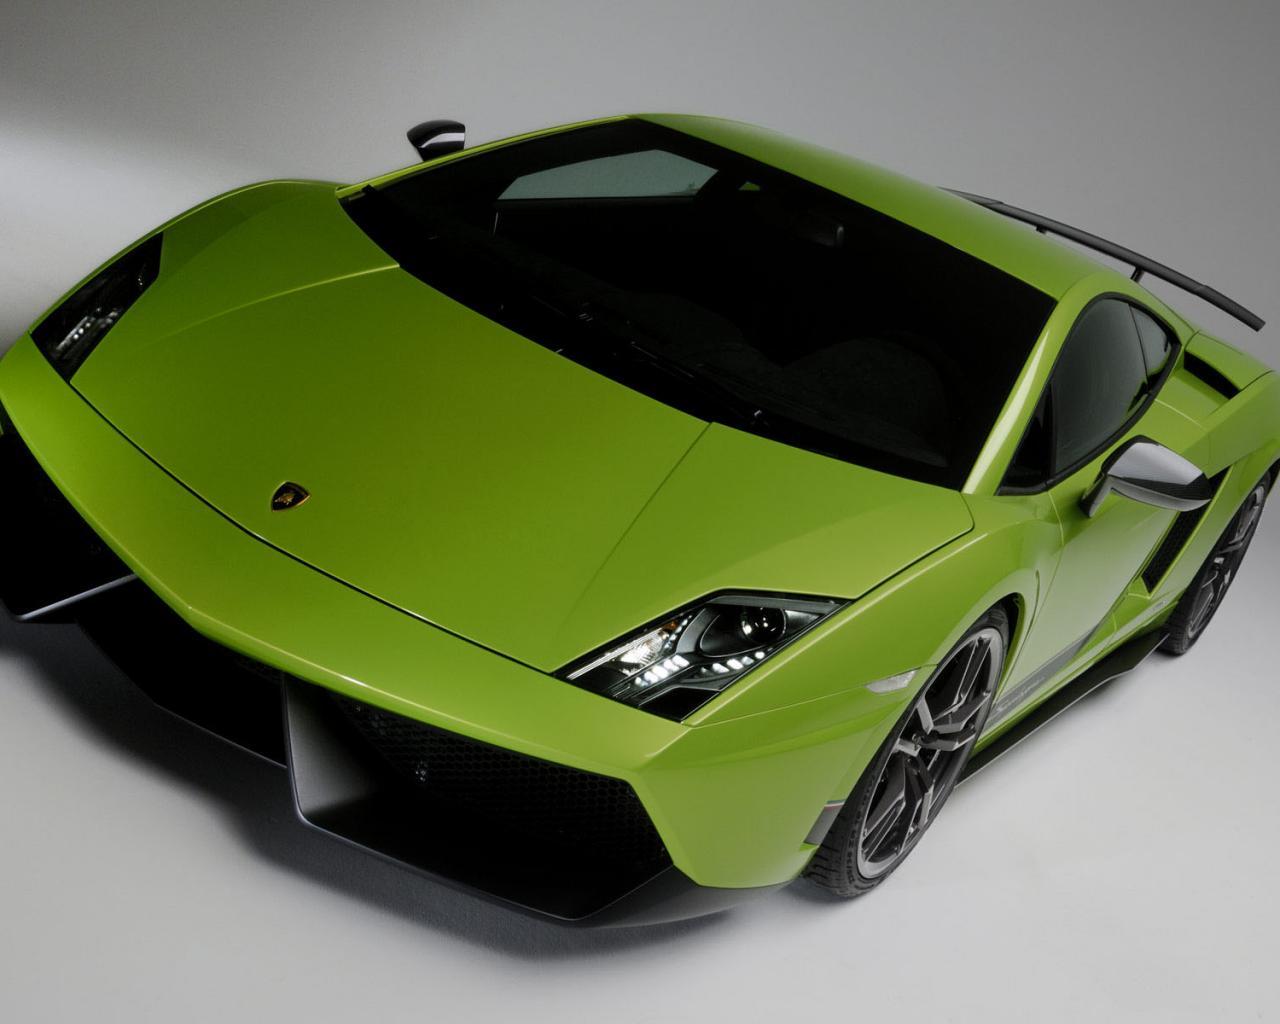 обои зеленого цвета: